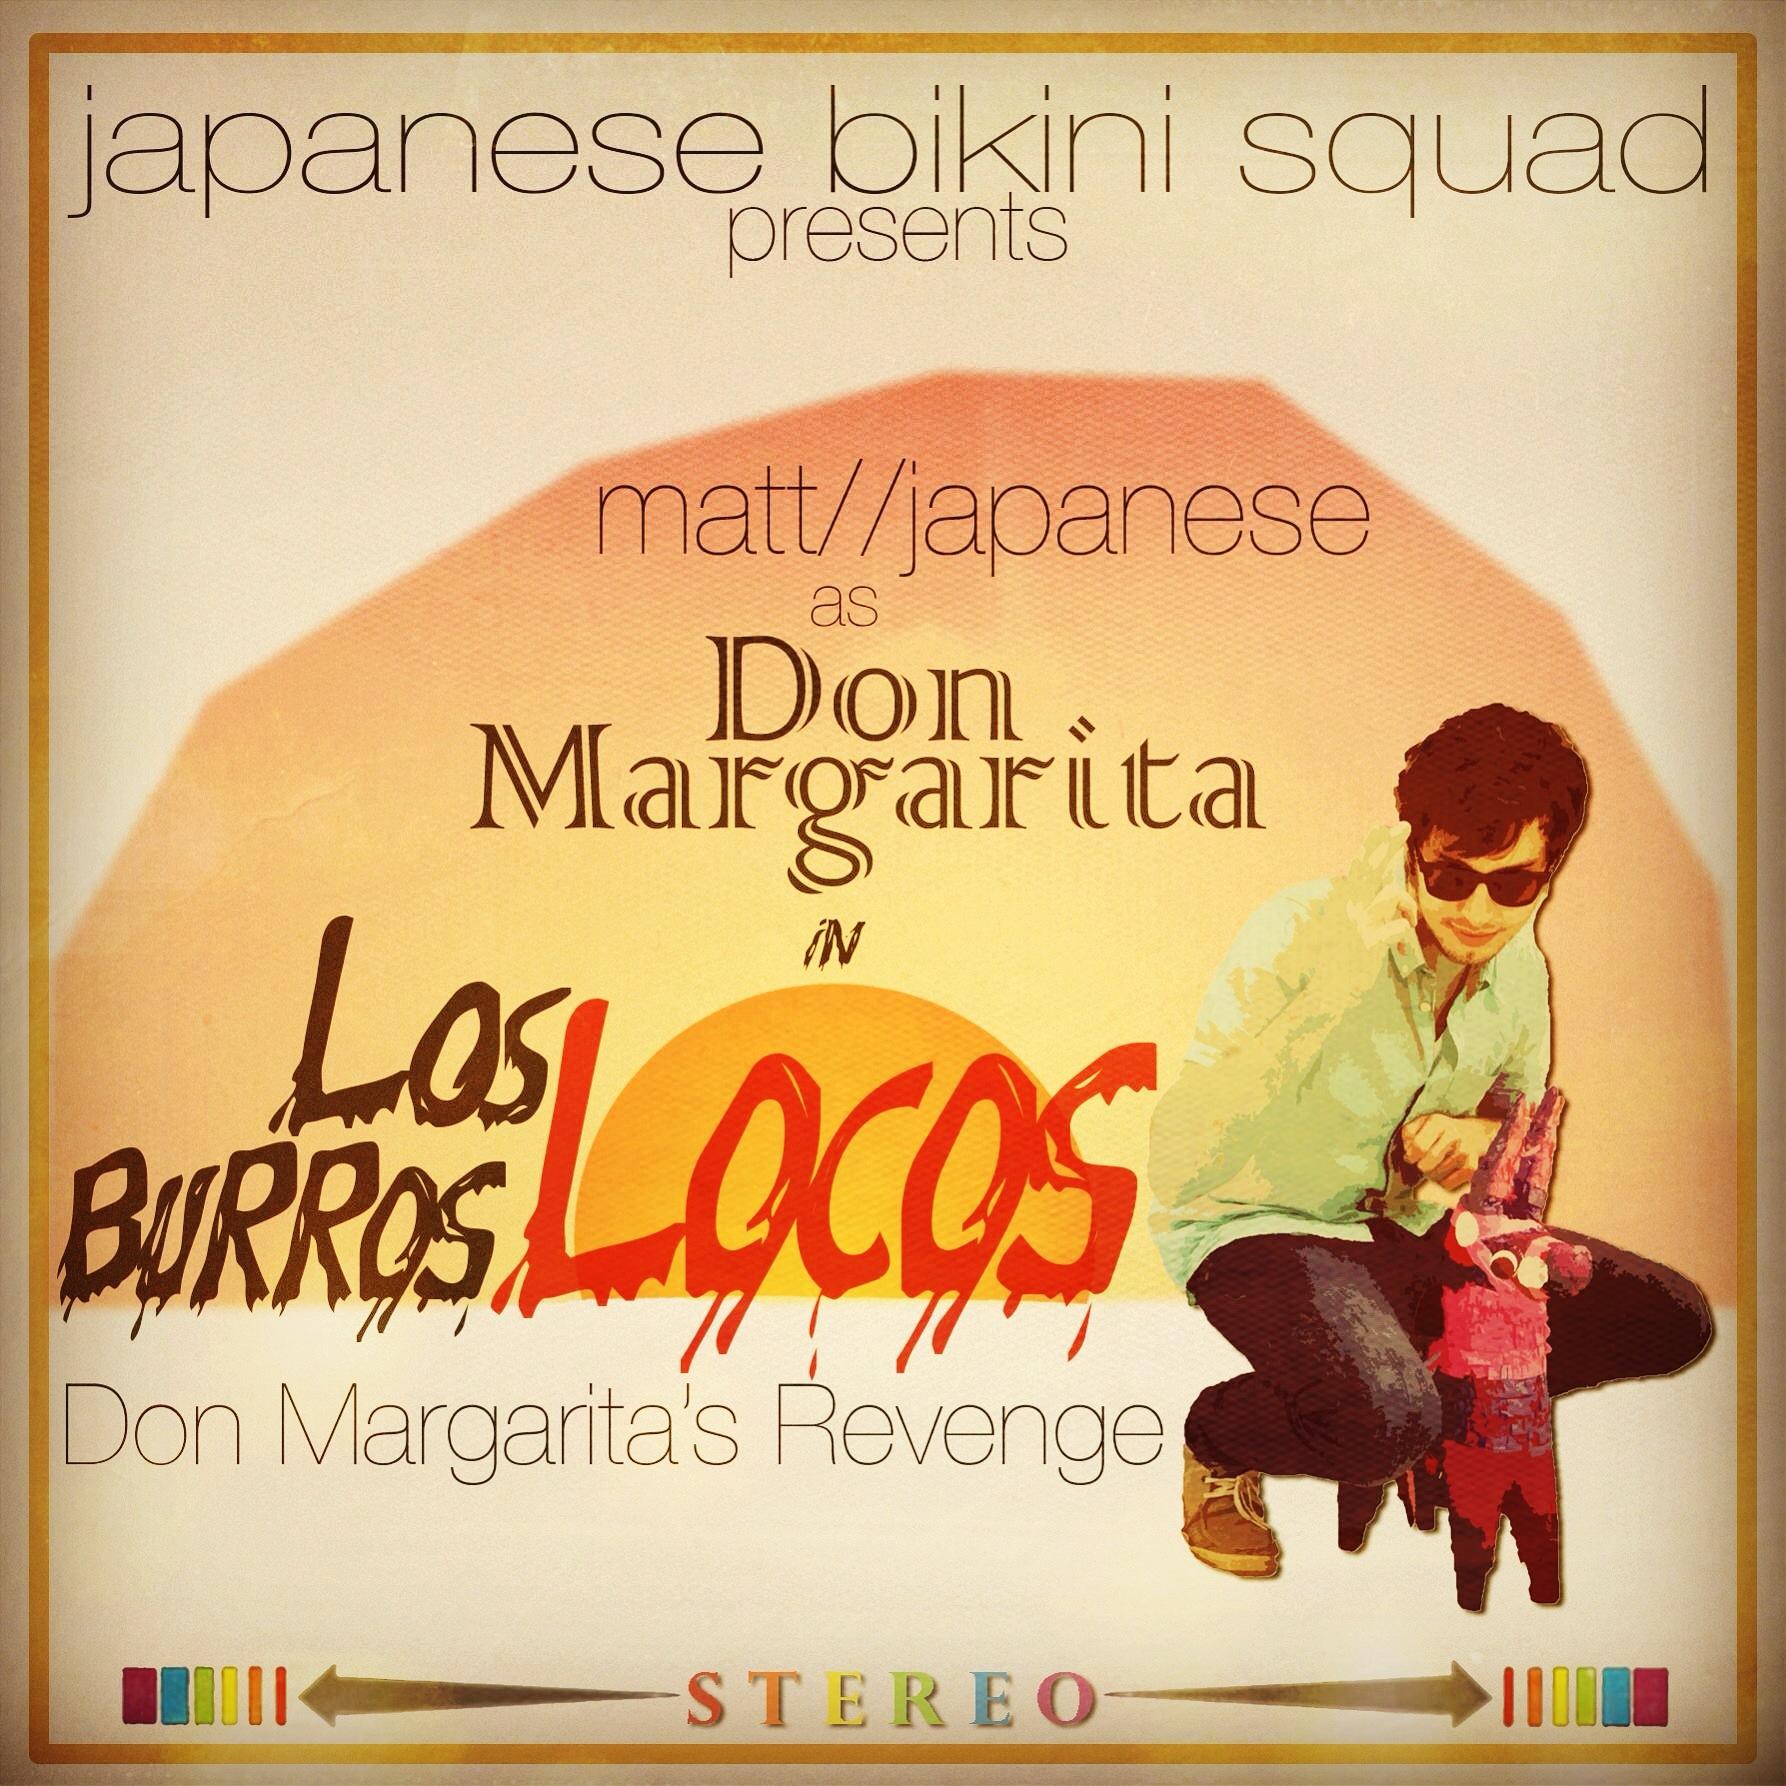 6_jbs_burros.JPG